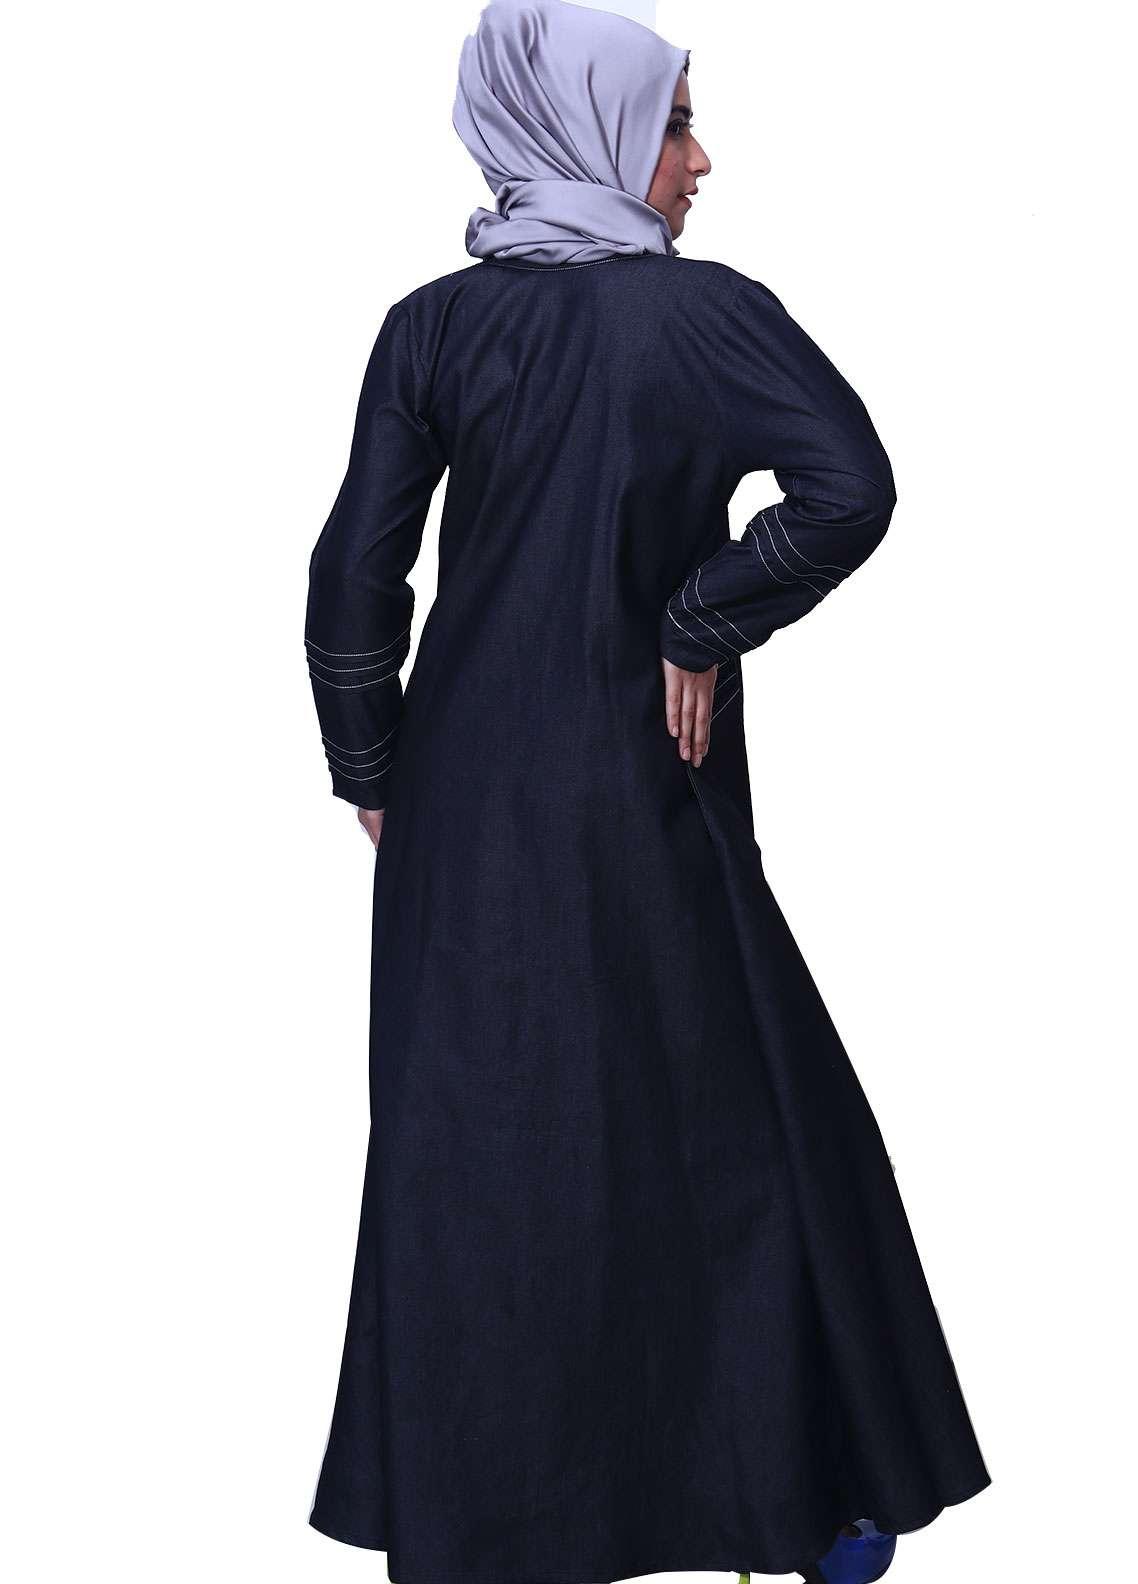 Black Denim Formal Style Abaya for Women - ABY18 012